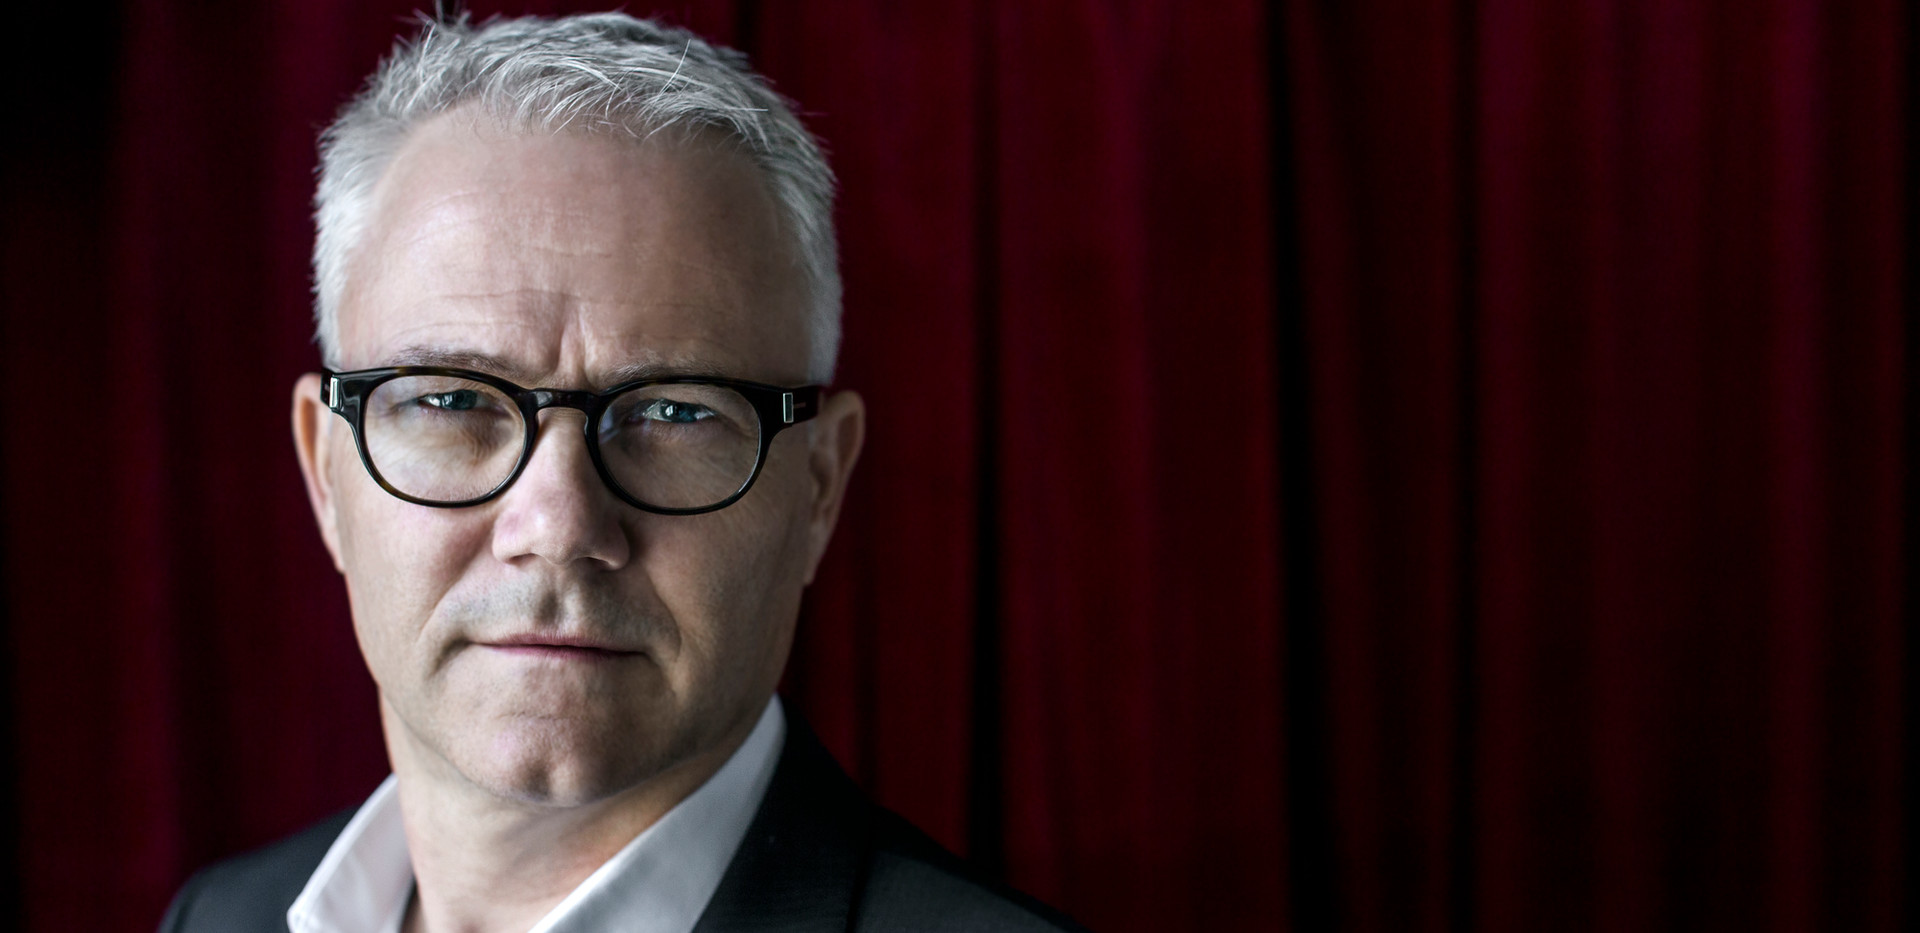 Karsten Jansfort